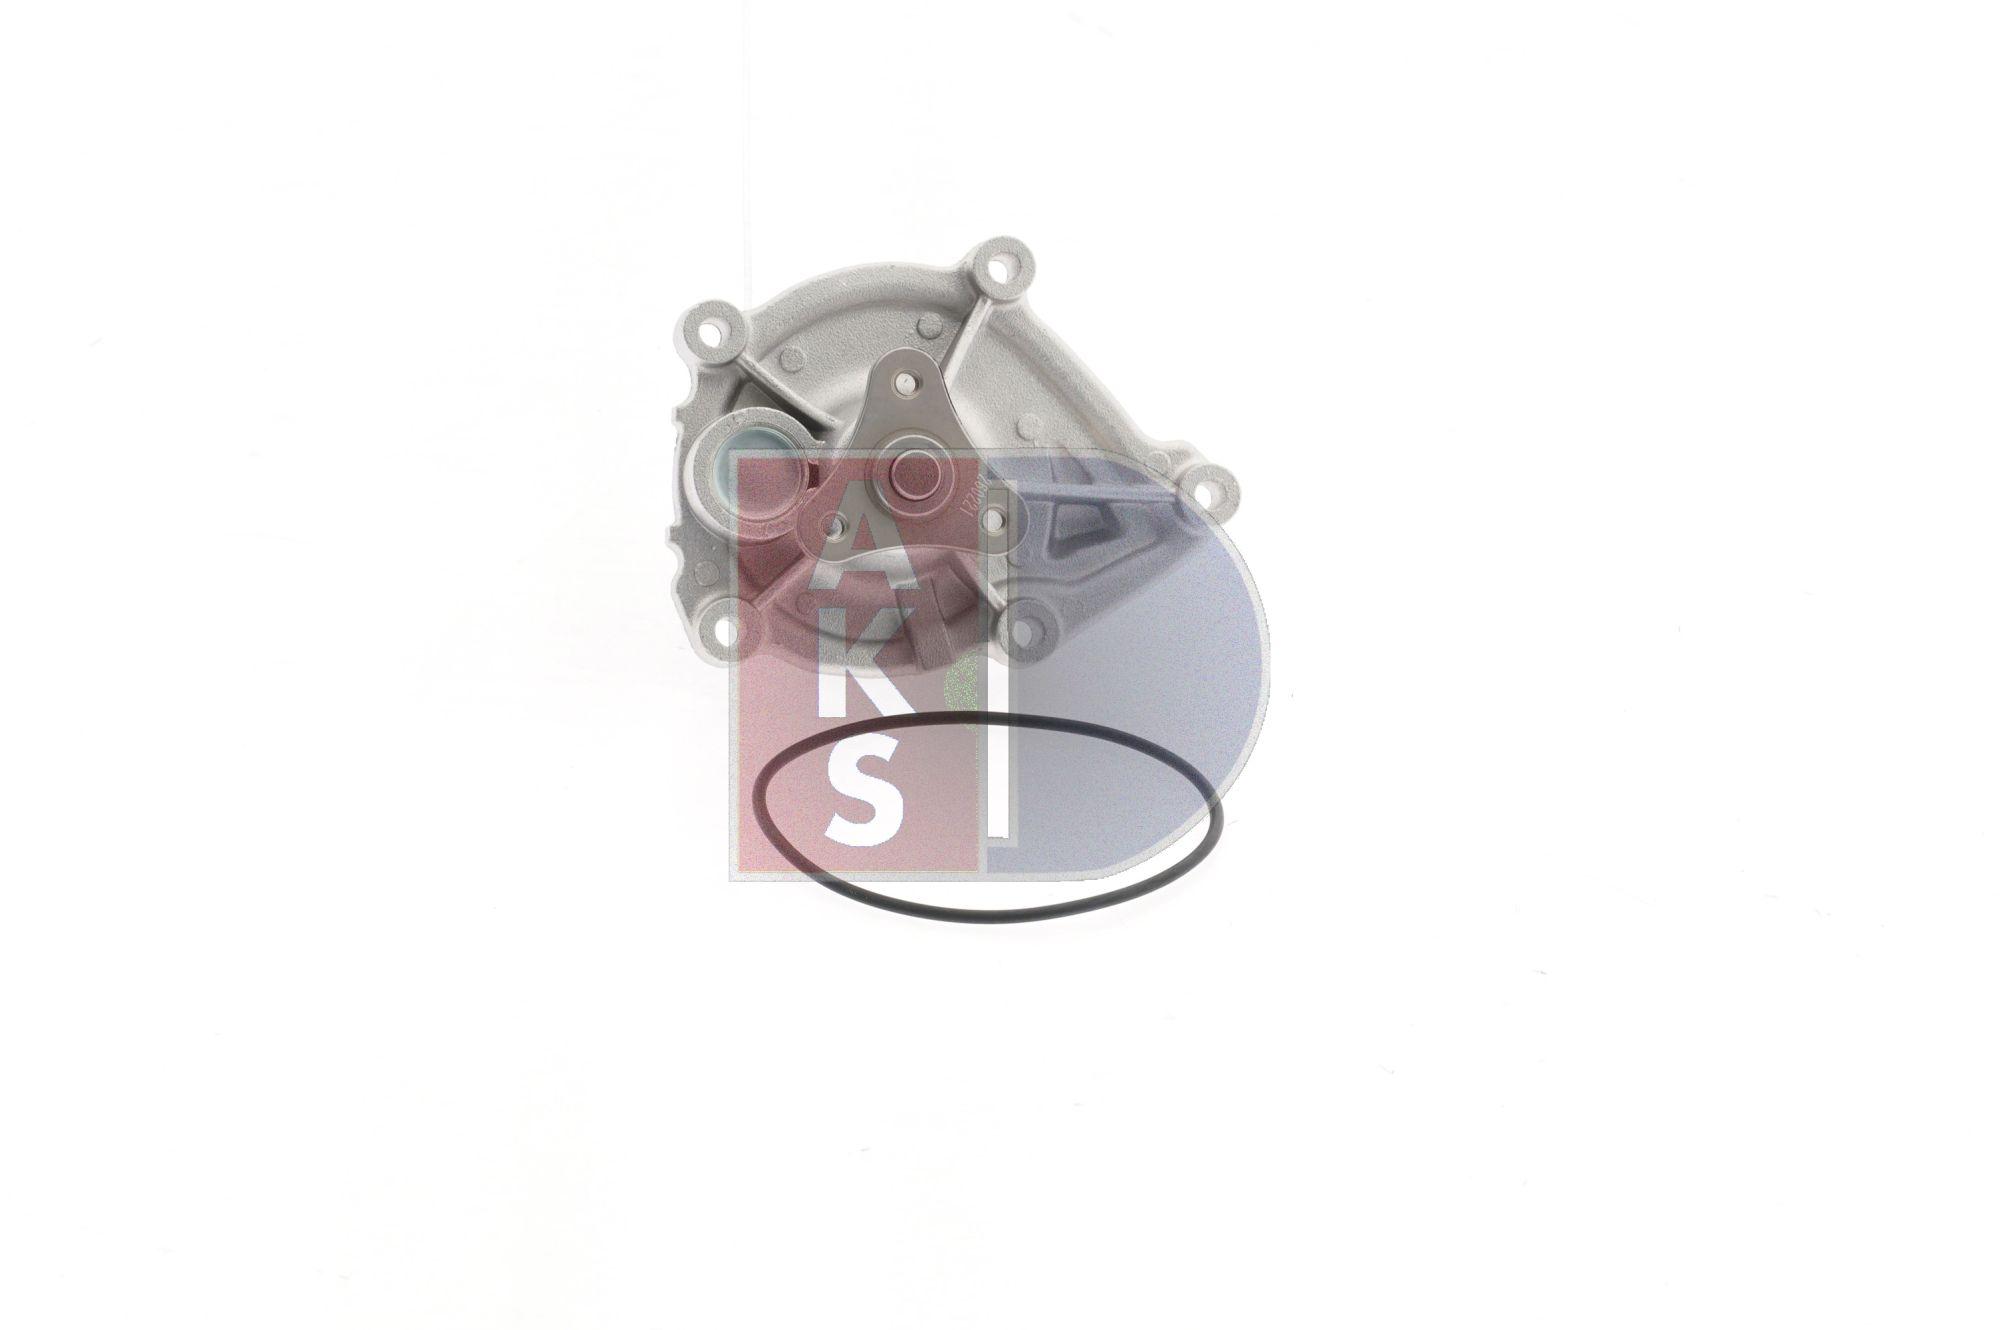 MINI CLUBMAN 2014 Wasserpumpe - Original AKS DASIS 570131N